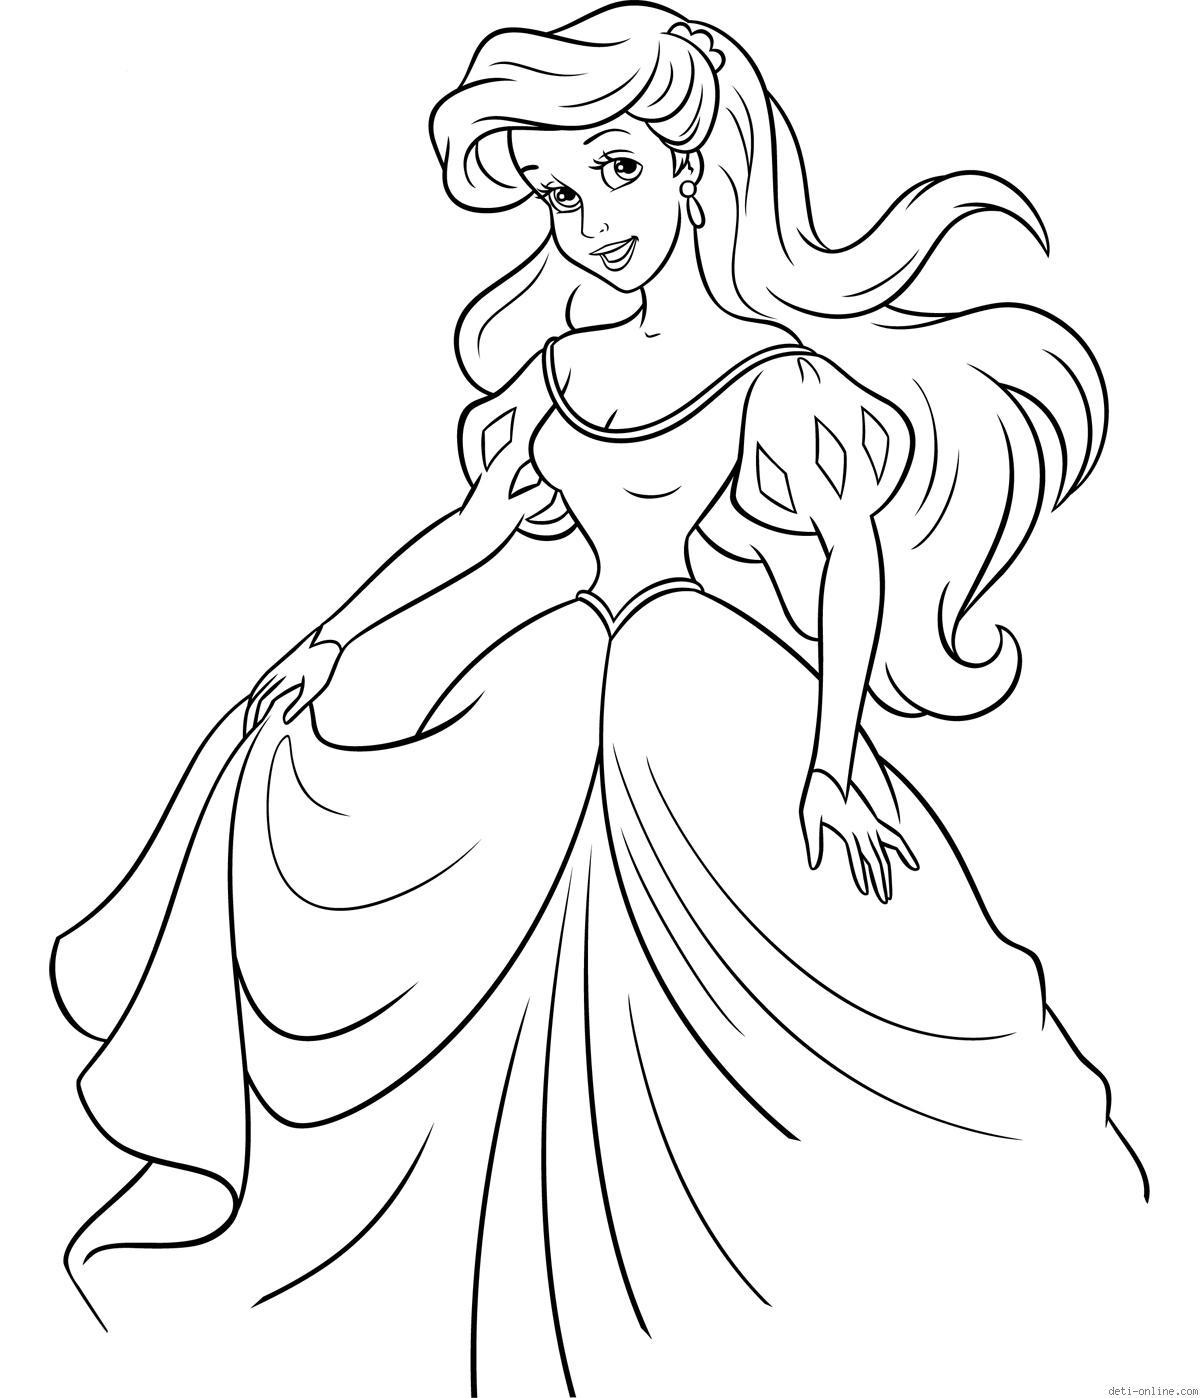 ариэль мультфильм Русалочка / The Little Mermaid (1989) смотреть онлайн или.